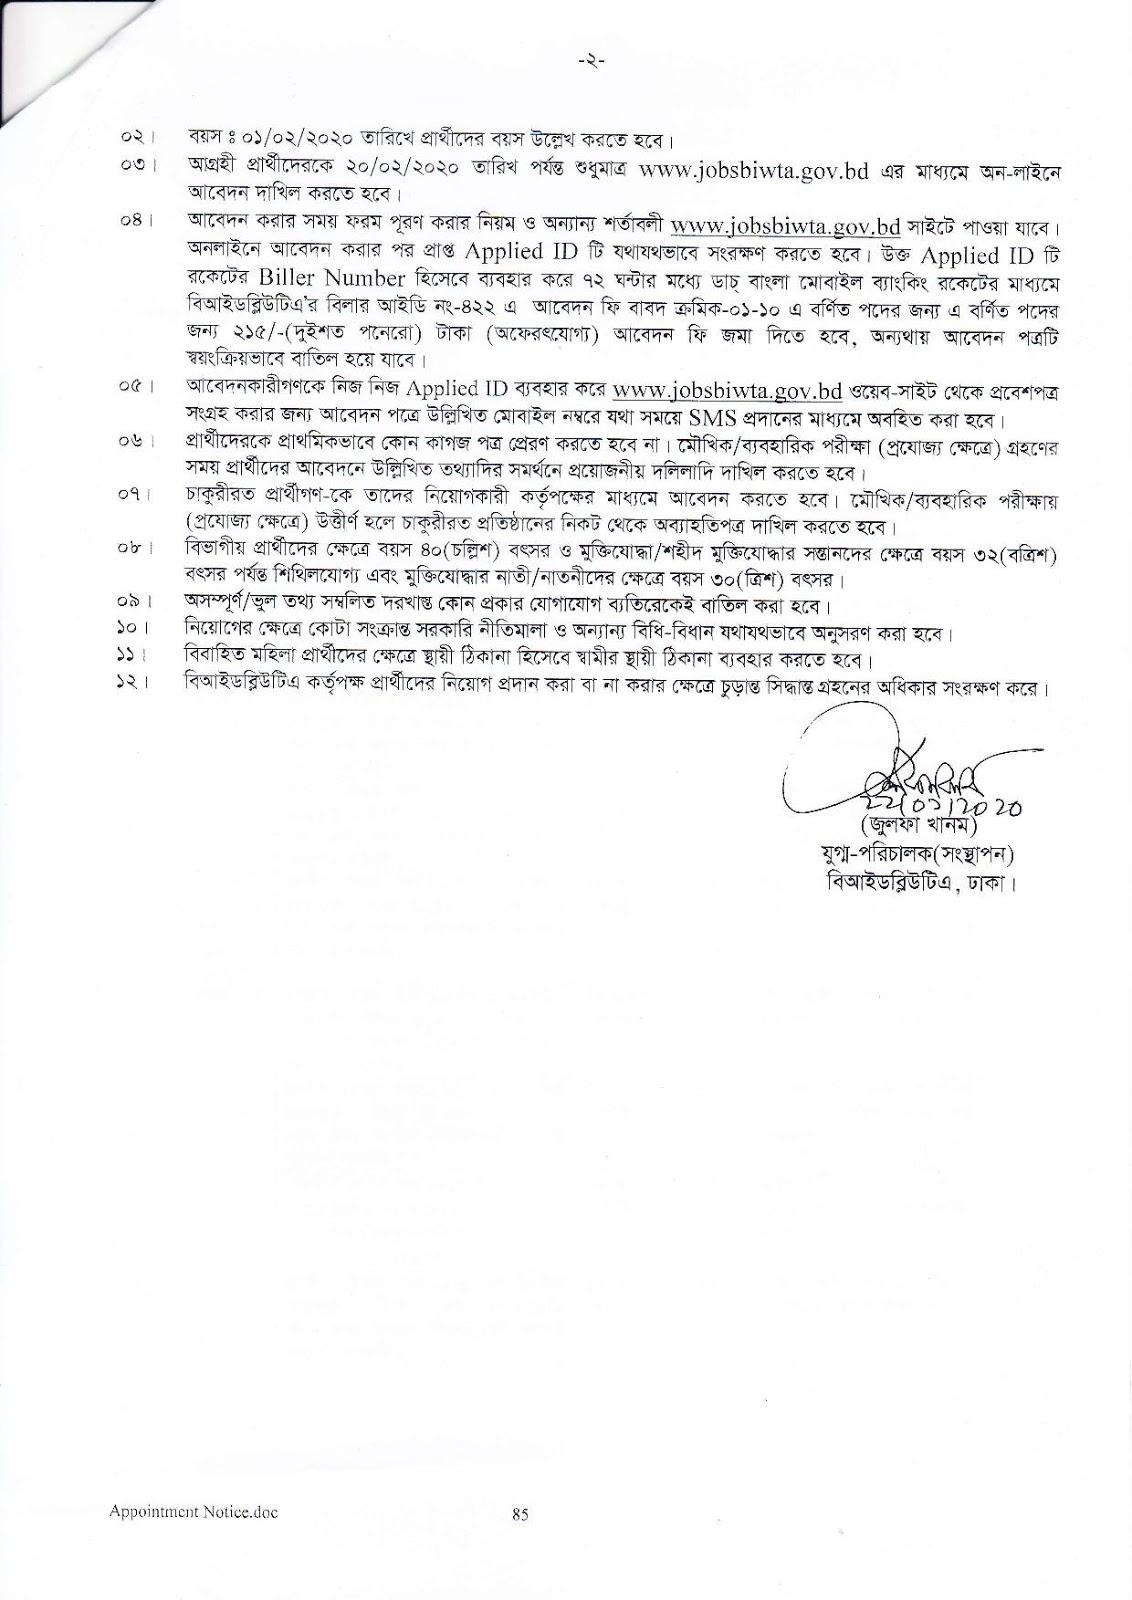 Bangladesh Inland Water Transport Authority